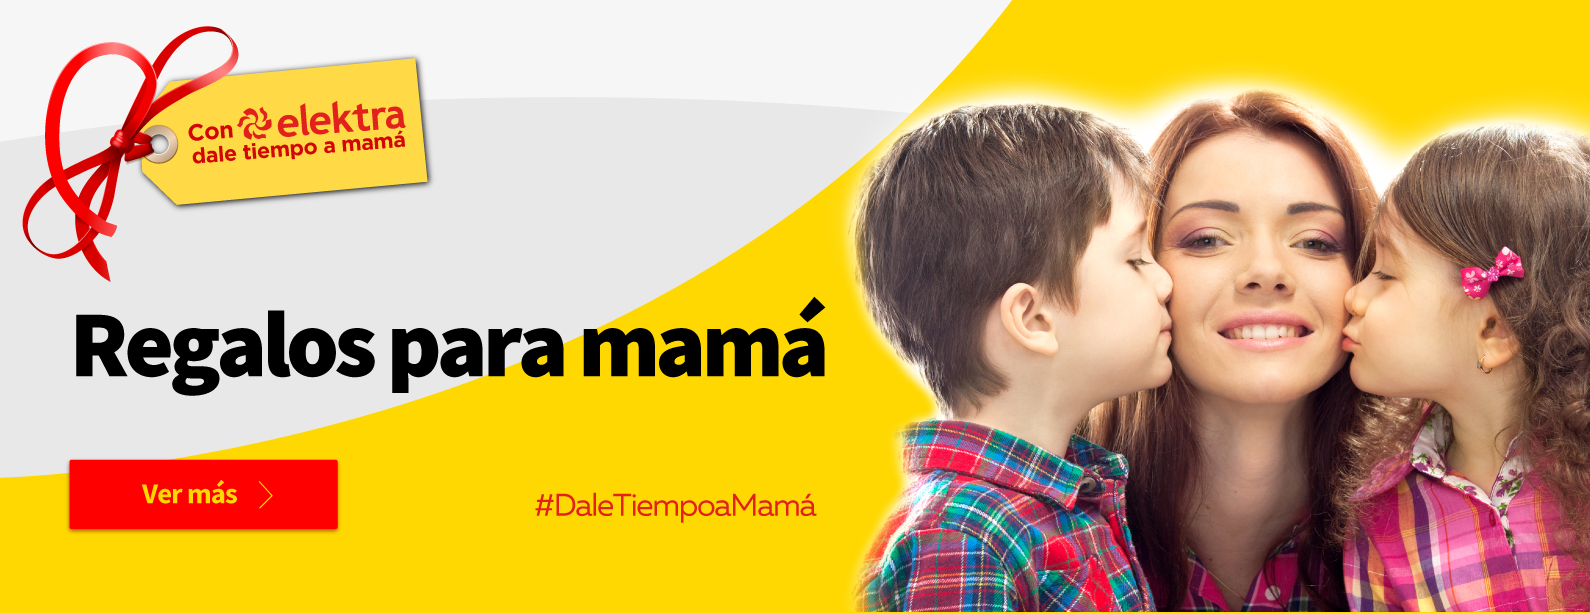 Box_banner_4_dia_de_las_madres_20180419